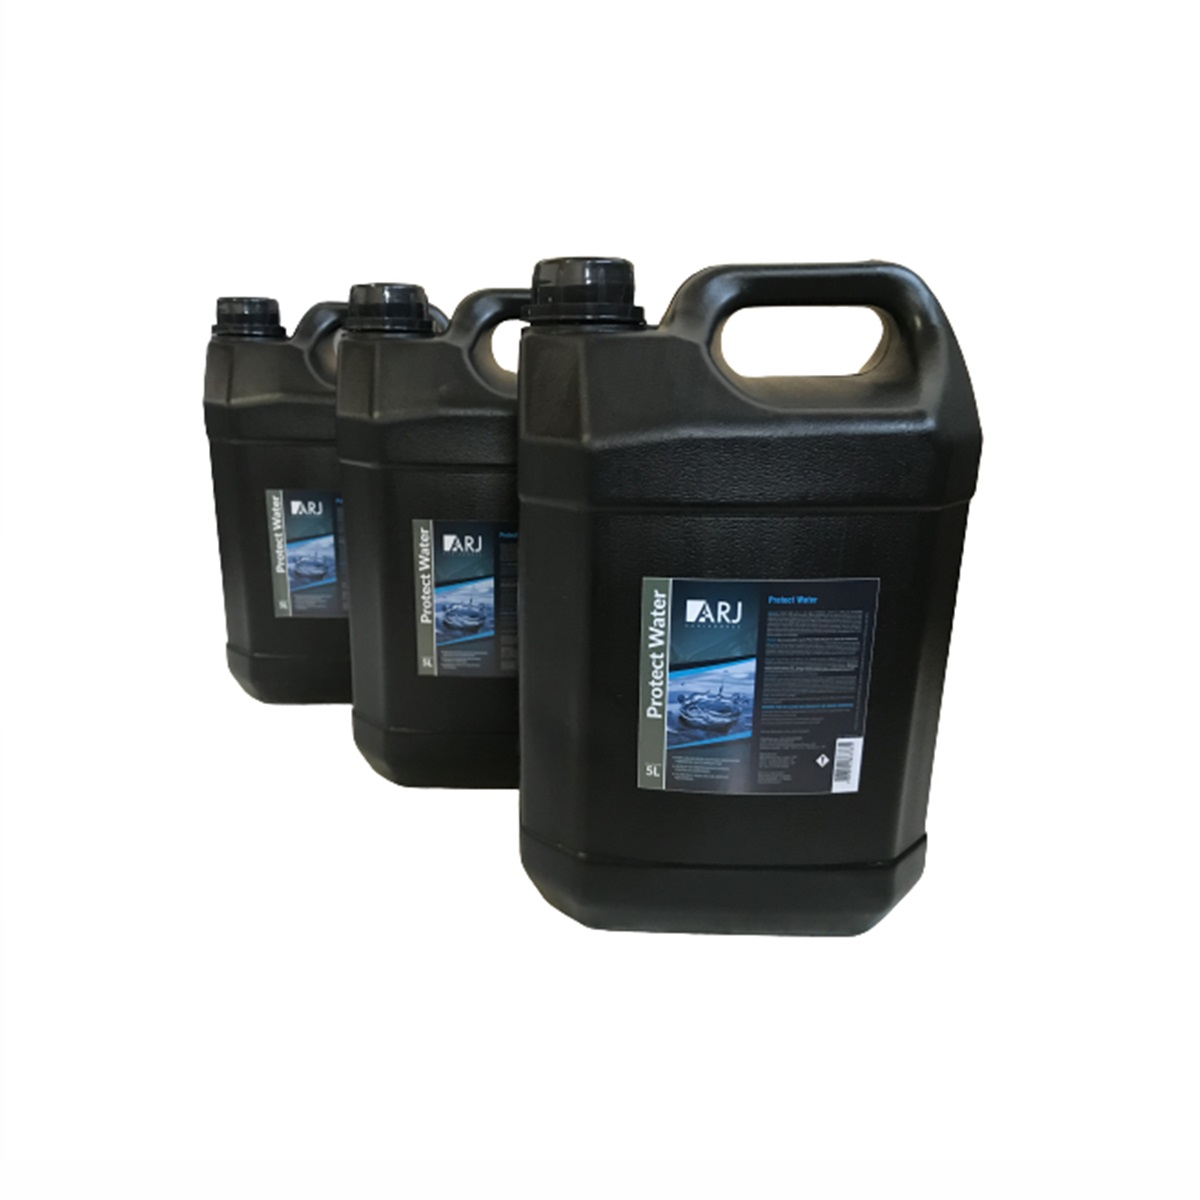 Protect Water Água Desmineralizada Arj 5lts Kit Com 3 Unidades